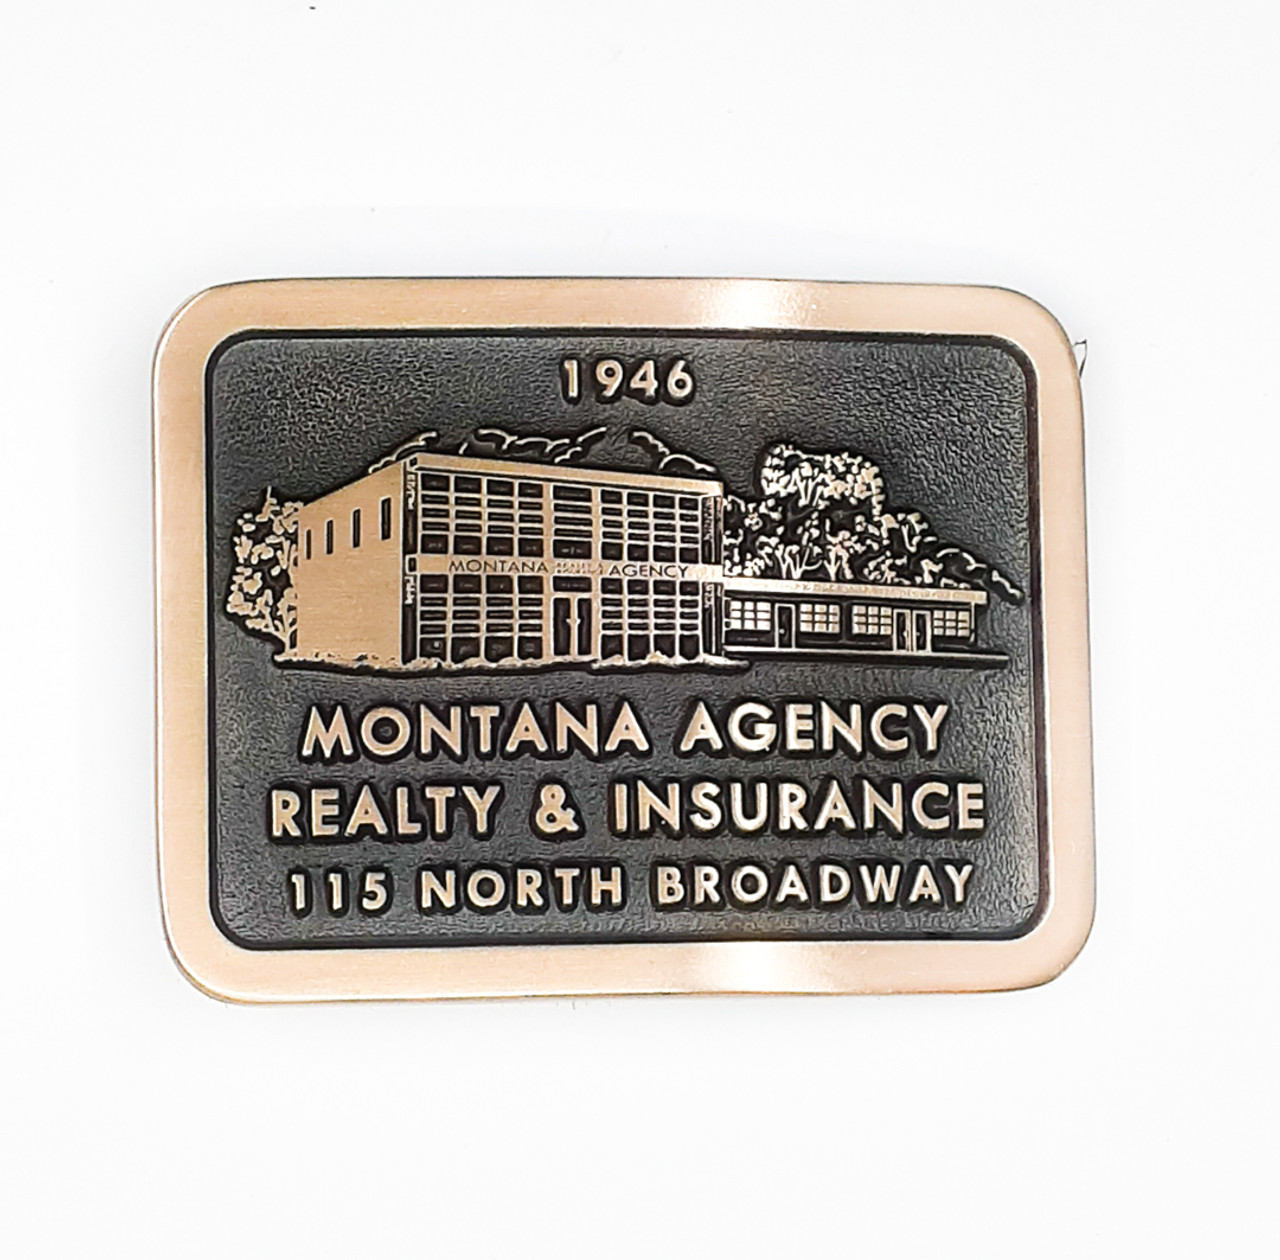 Montana Agency  Realty & Insurance Buckle